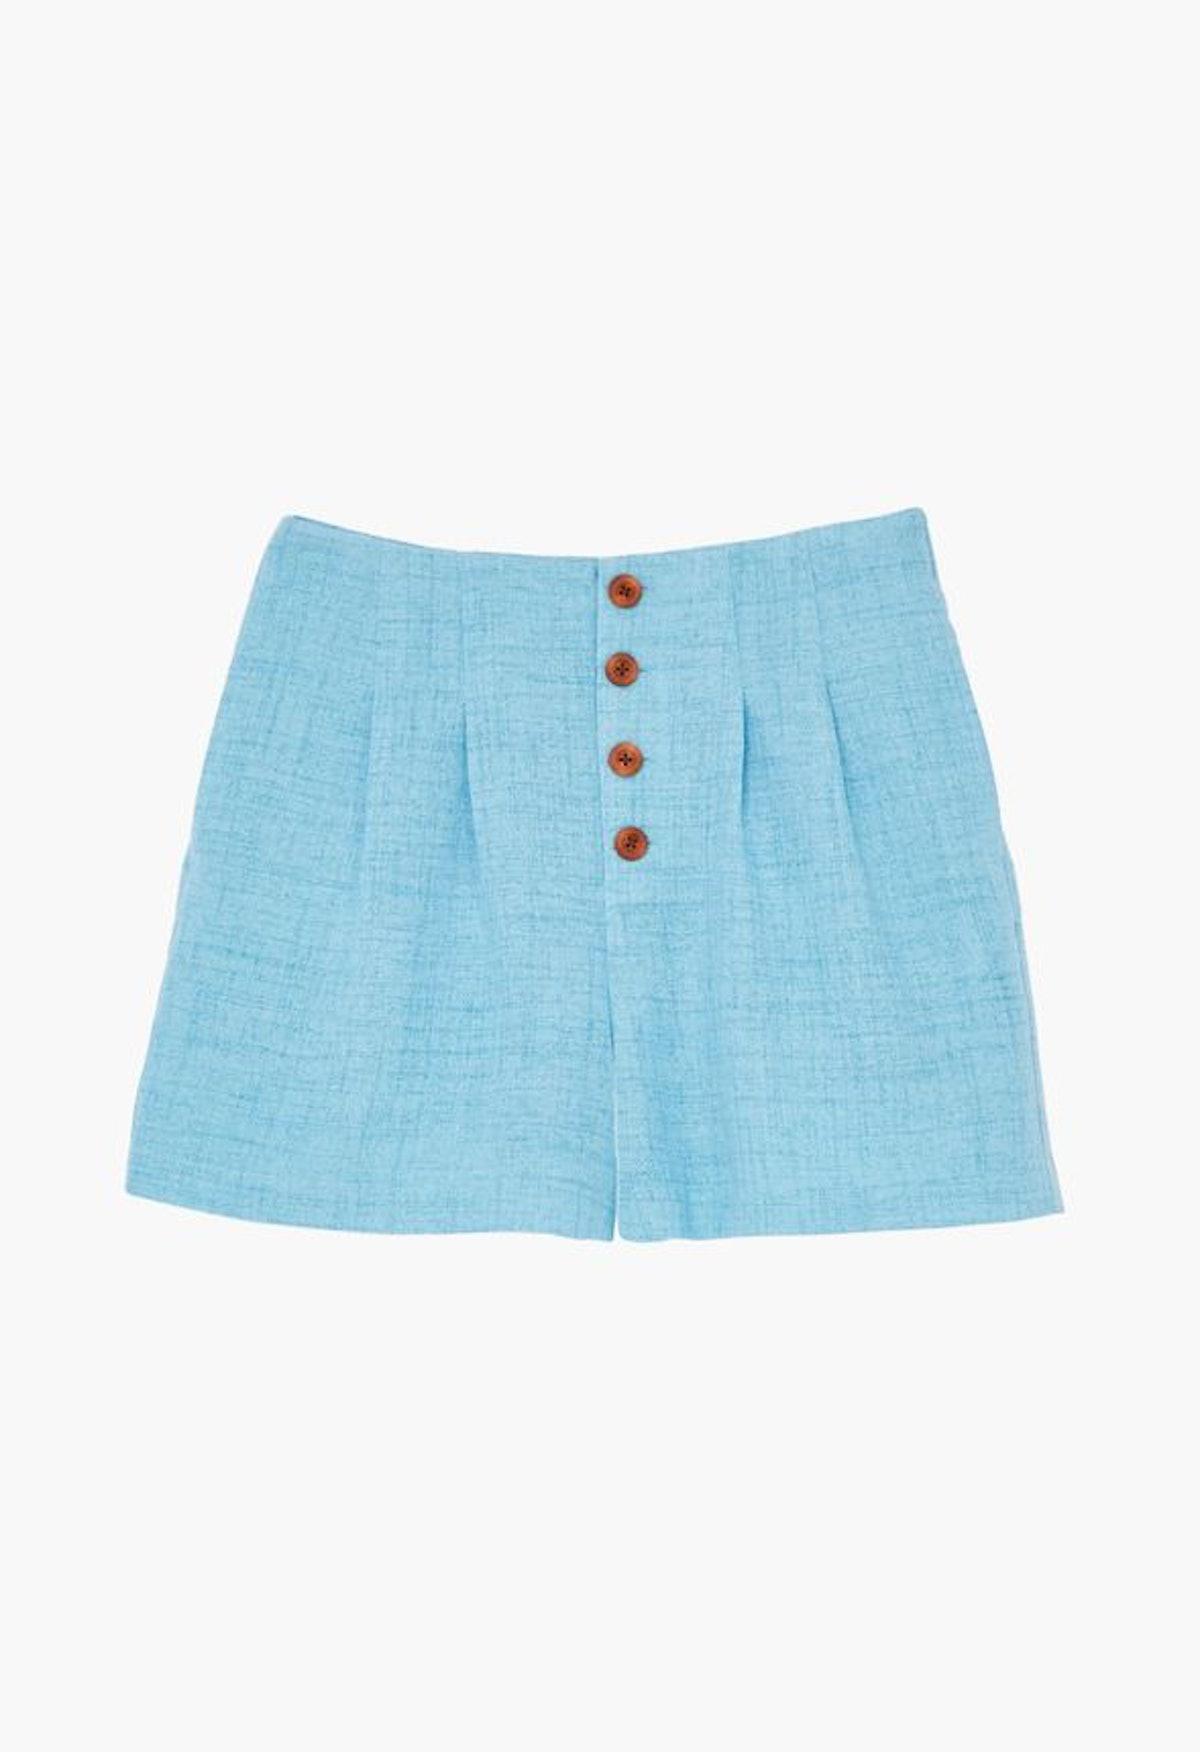 JustFab High Rise Pleated Shorts